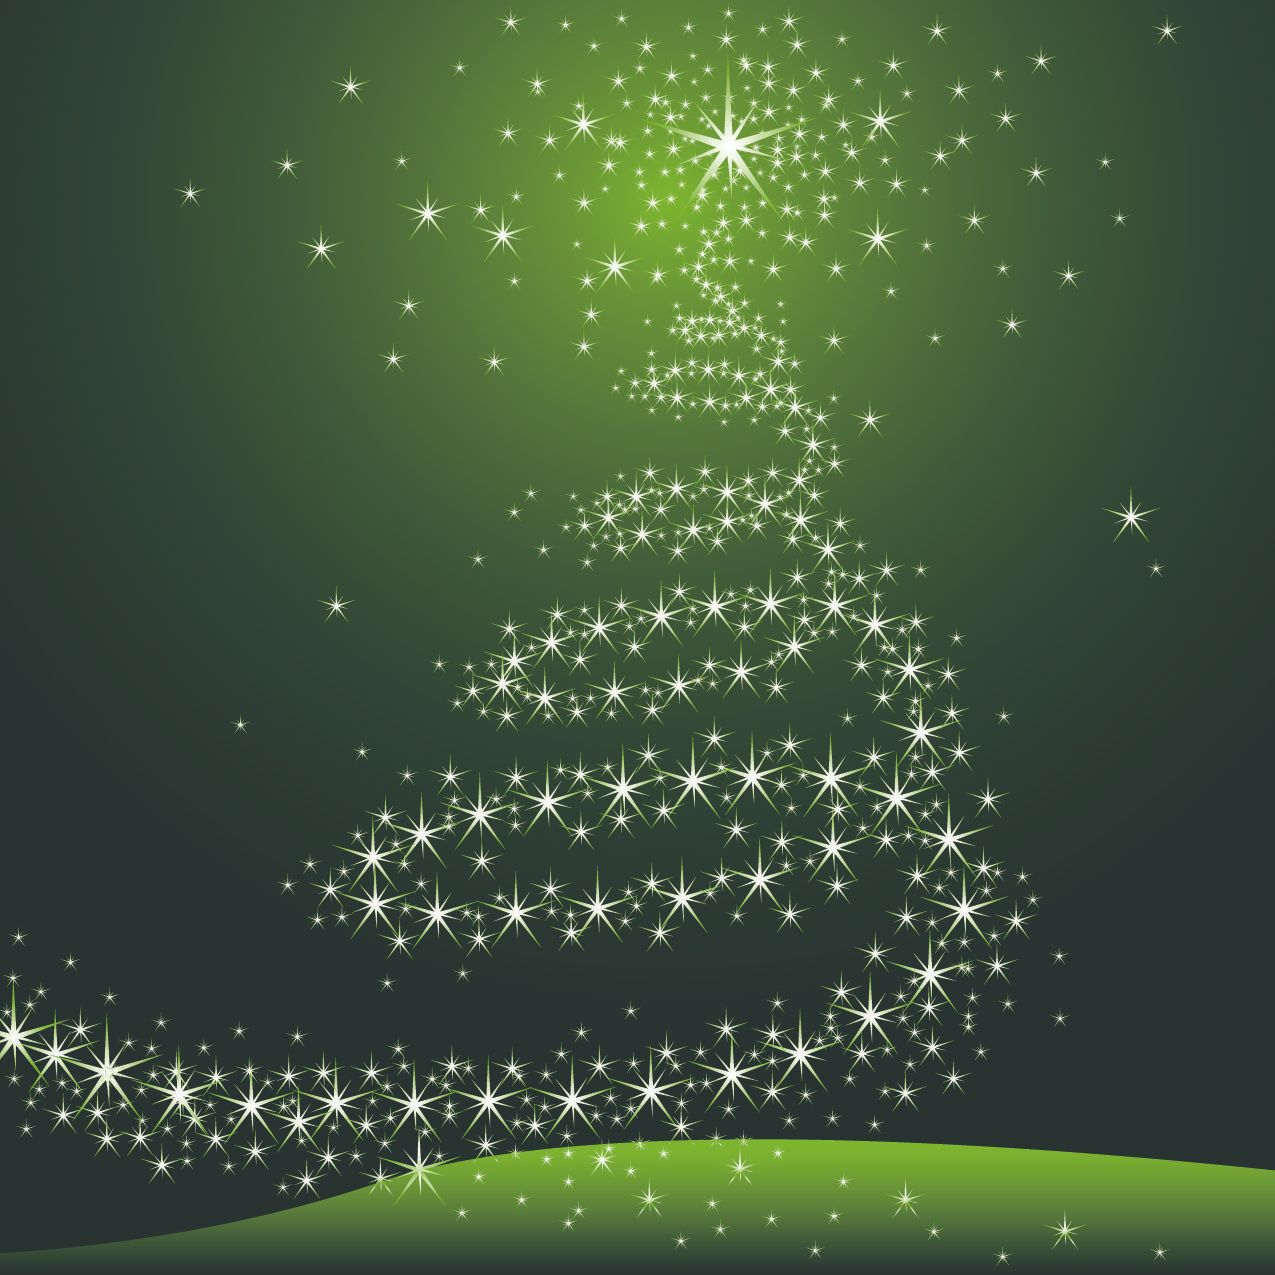 image user - Starry Christmas